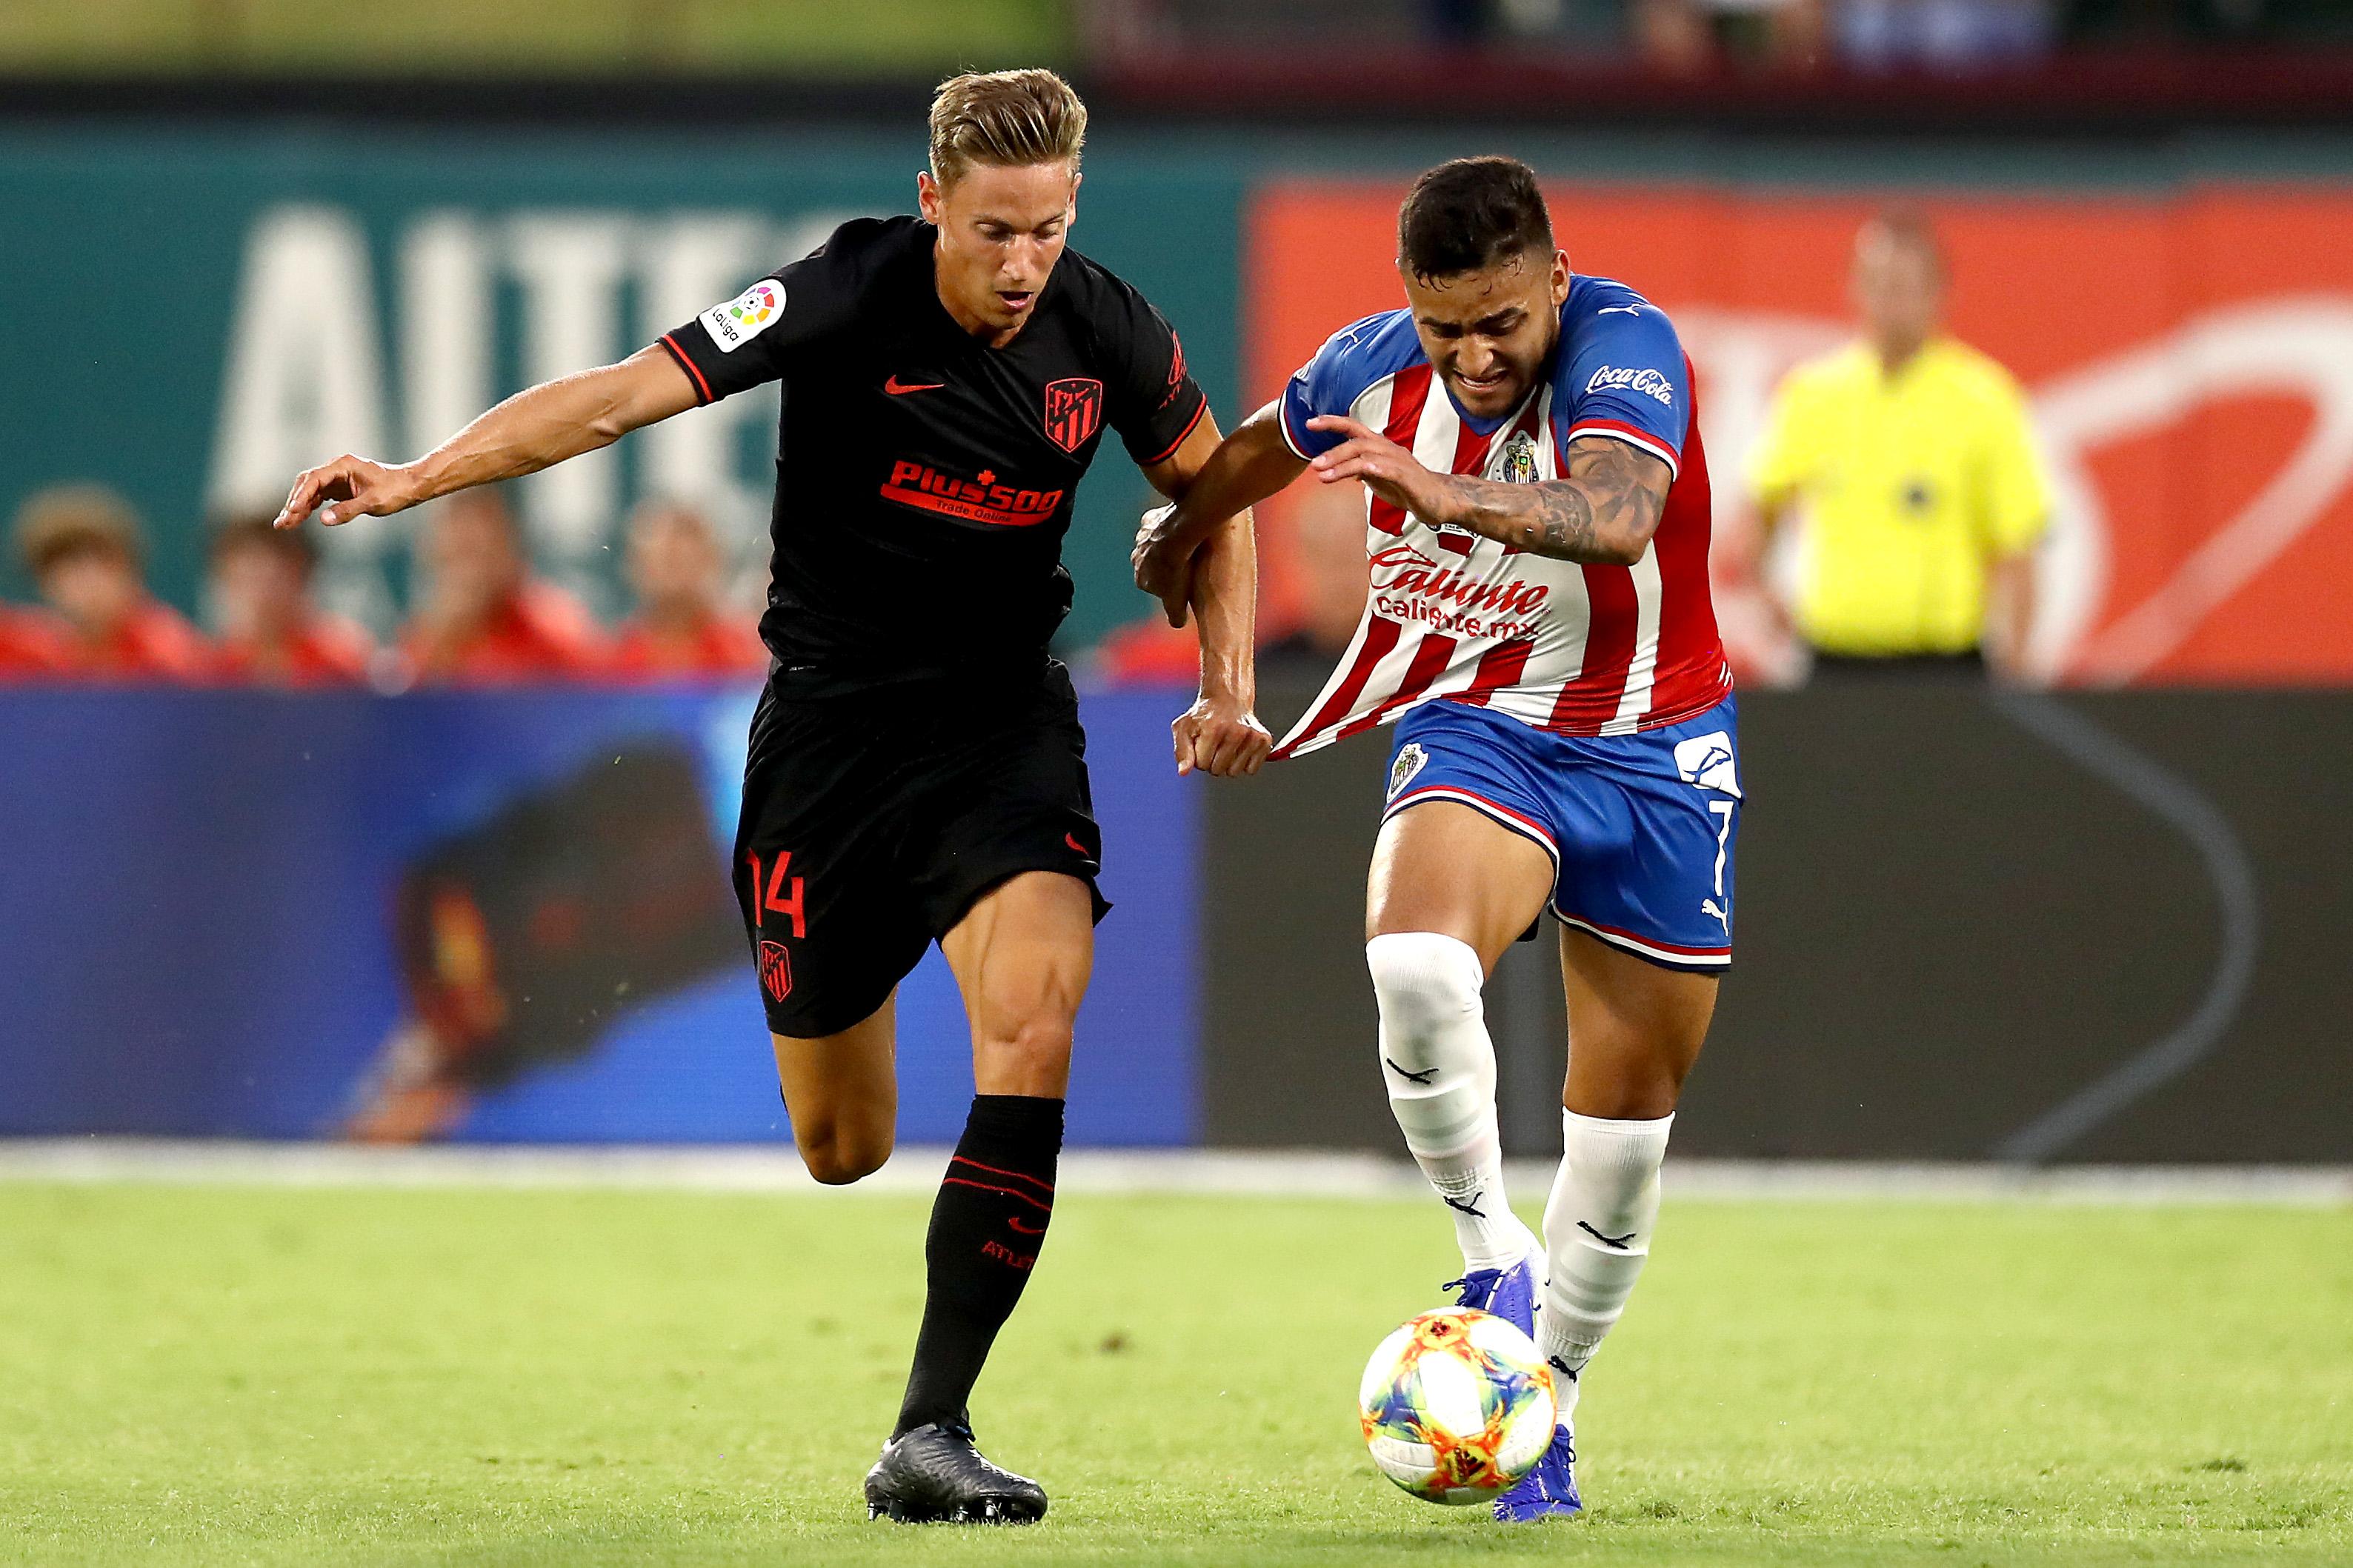 Chivas de Guadalajara v Atletico de Madrid - 2019 International Champions Cup